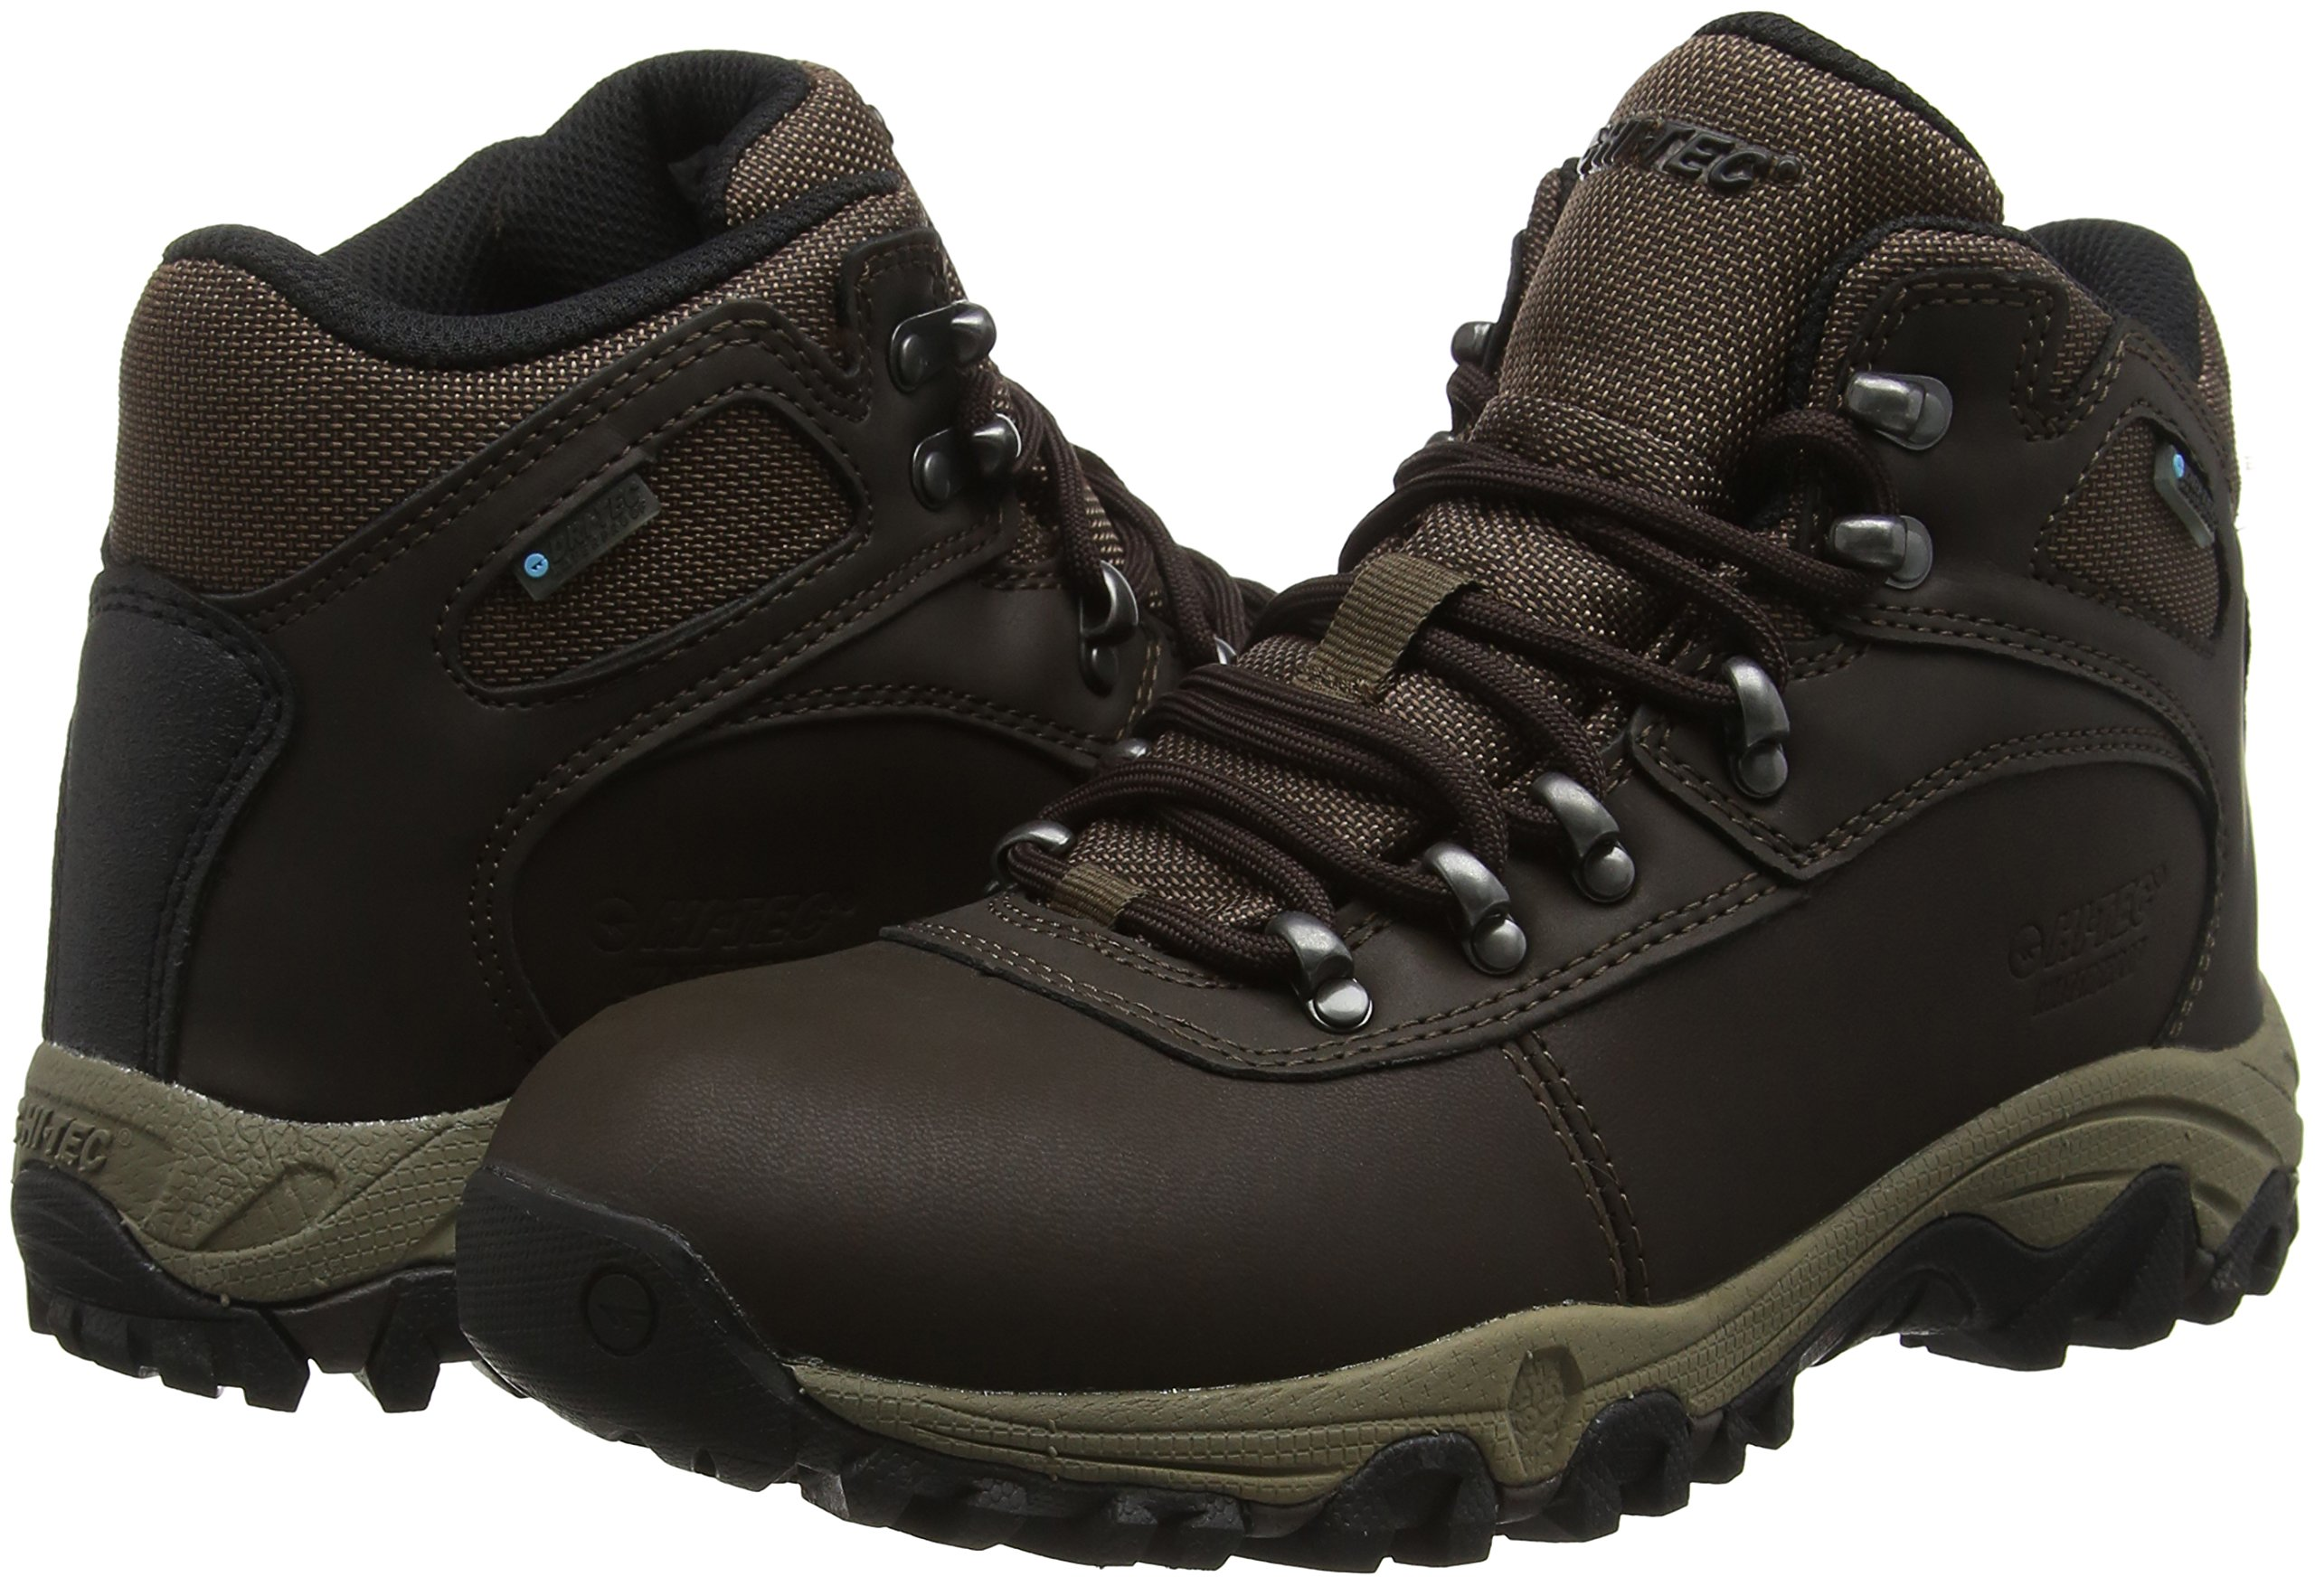 Hi-Tec Women's Cascadia Waterproof High Rise Hiking Boots 5